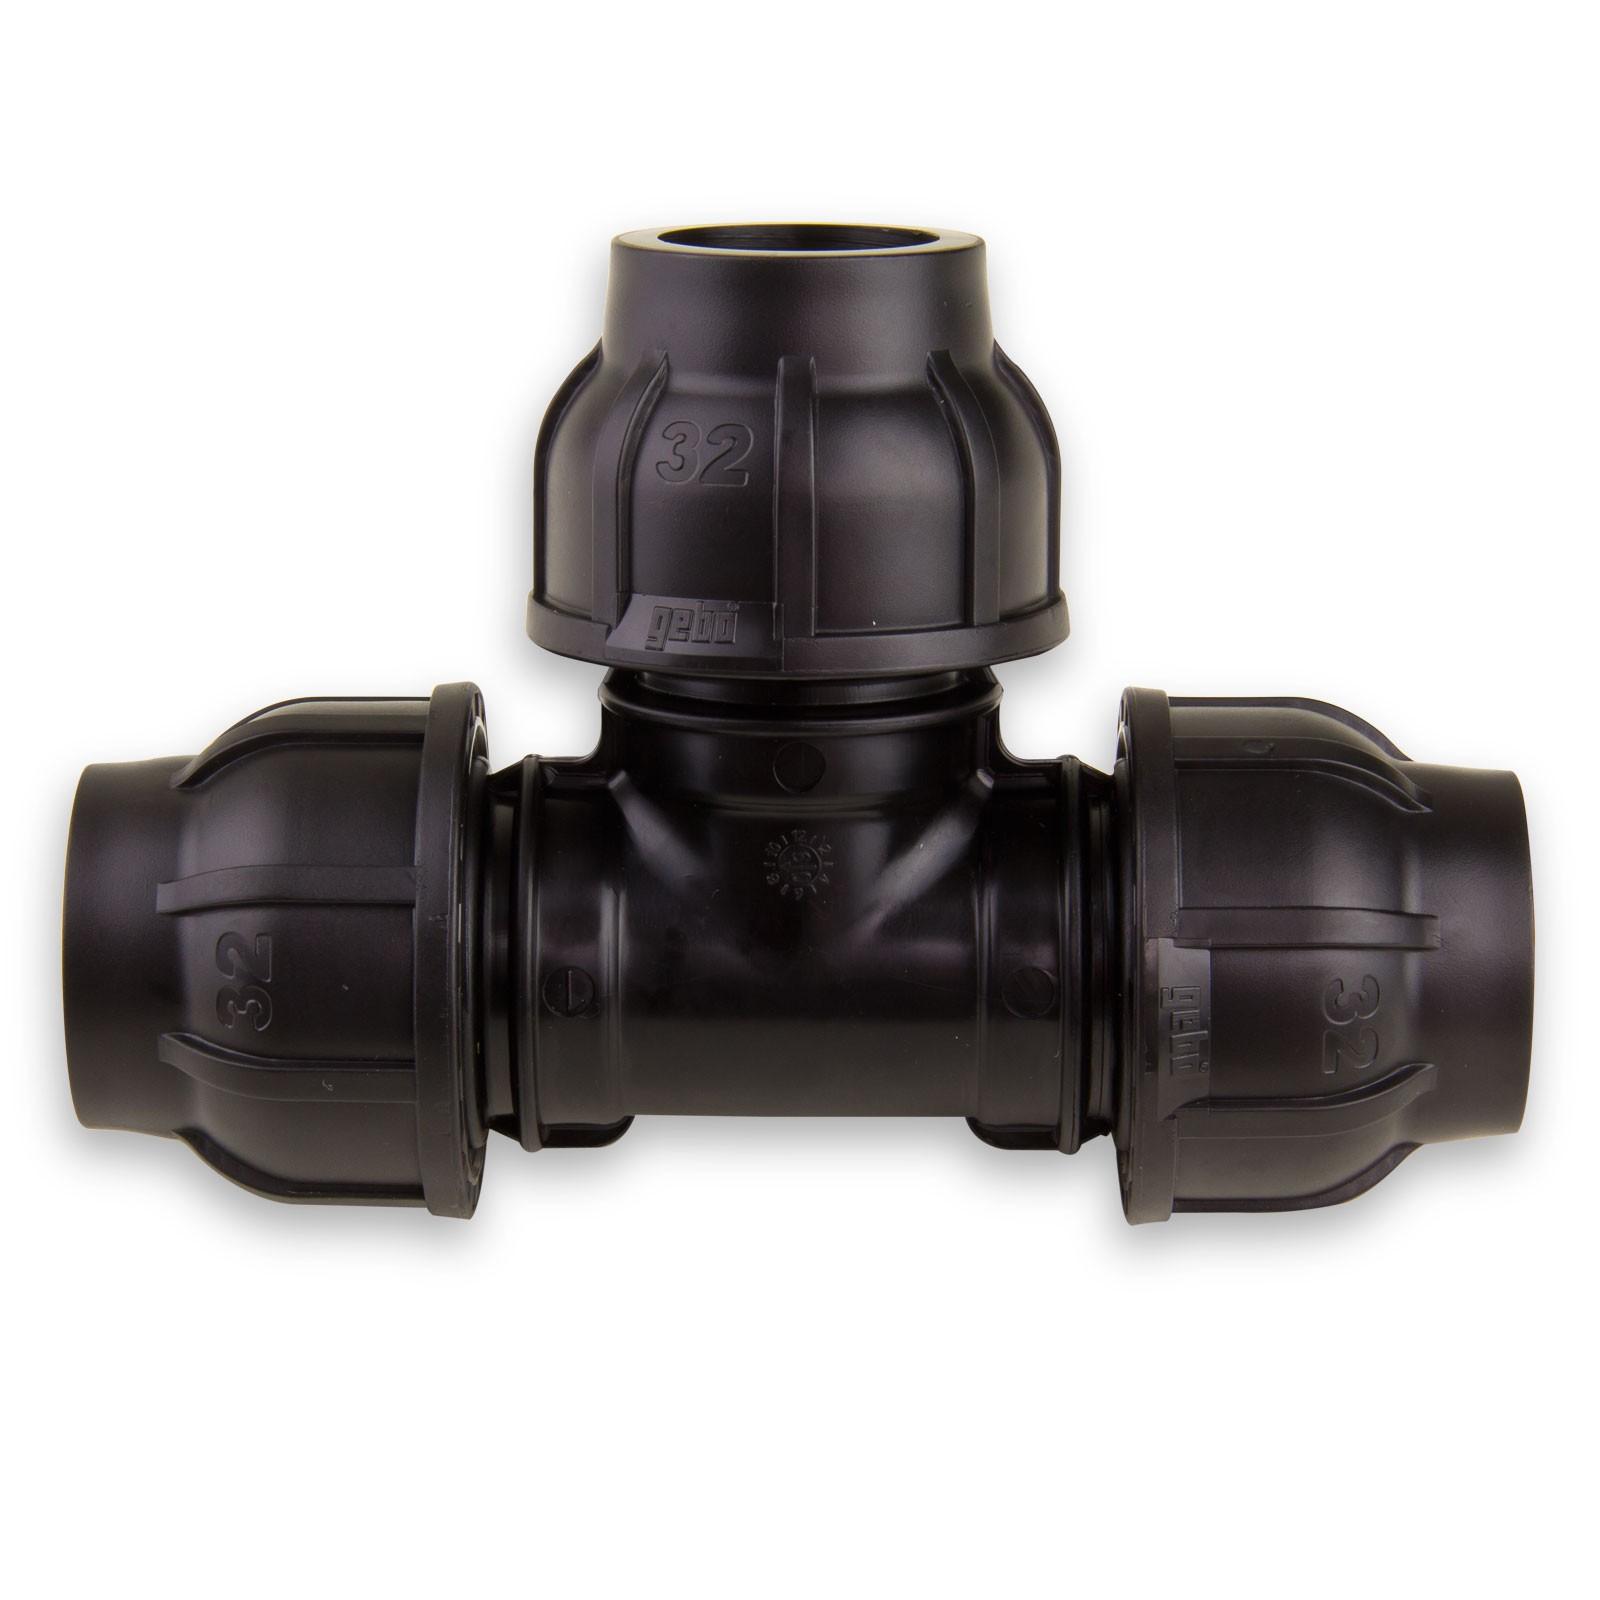 PE Rohr T-Stück Verschraubung 63 x 50 mm Reduzierung